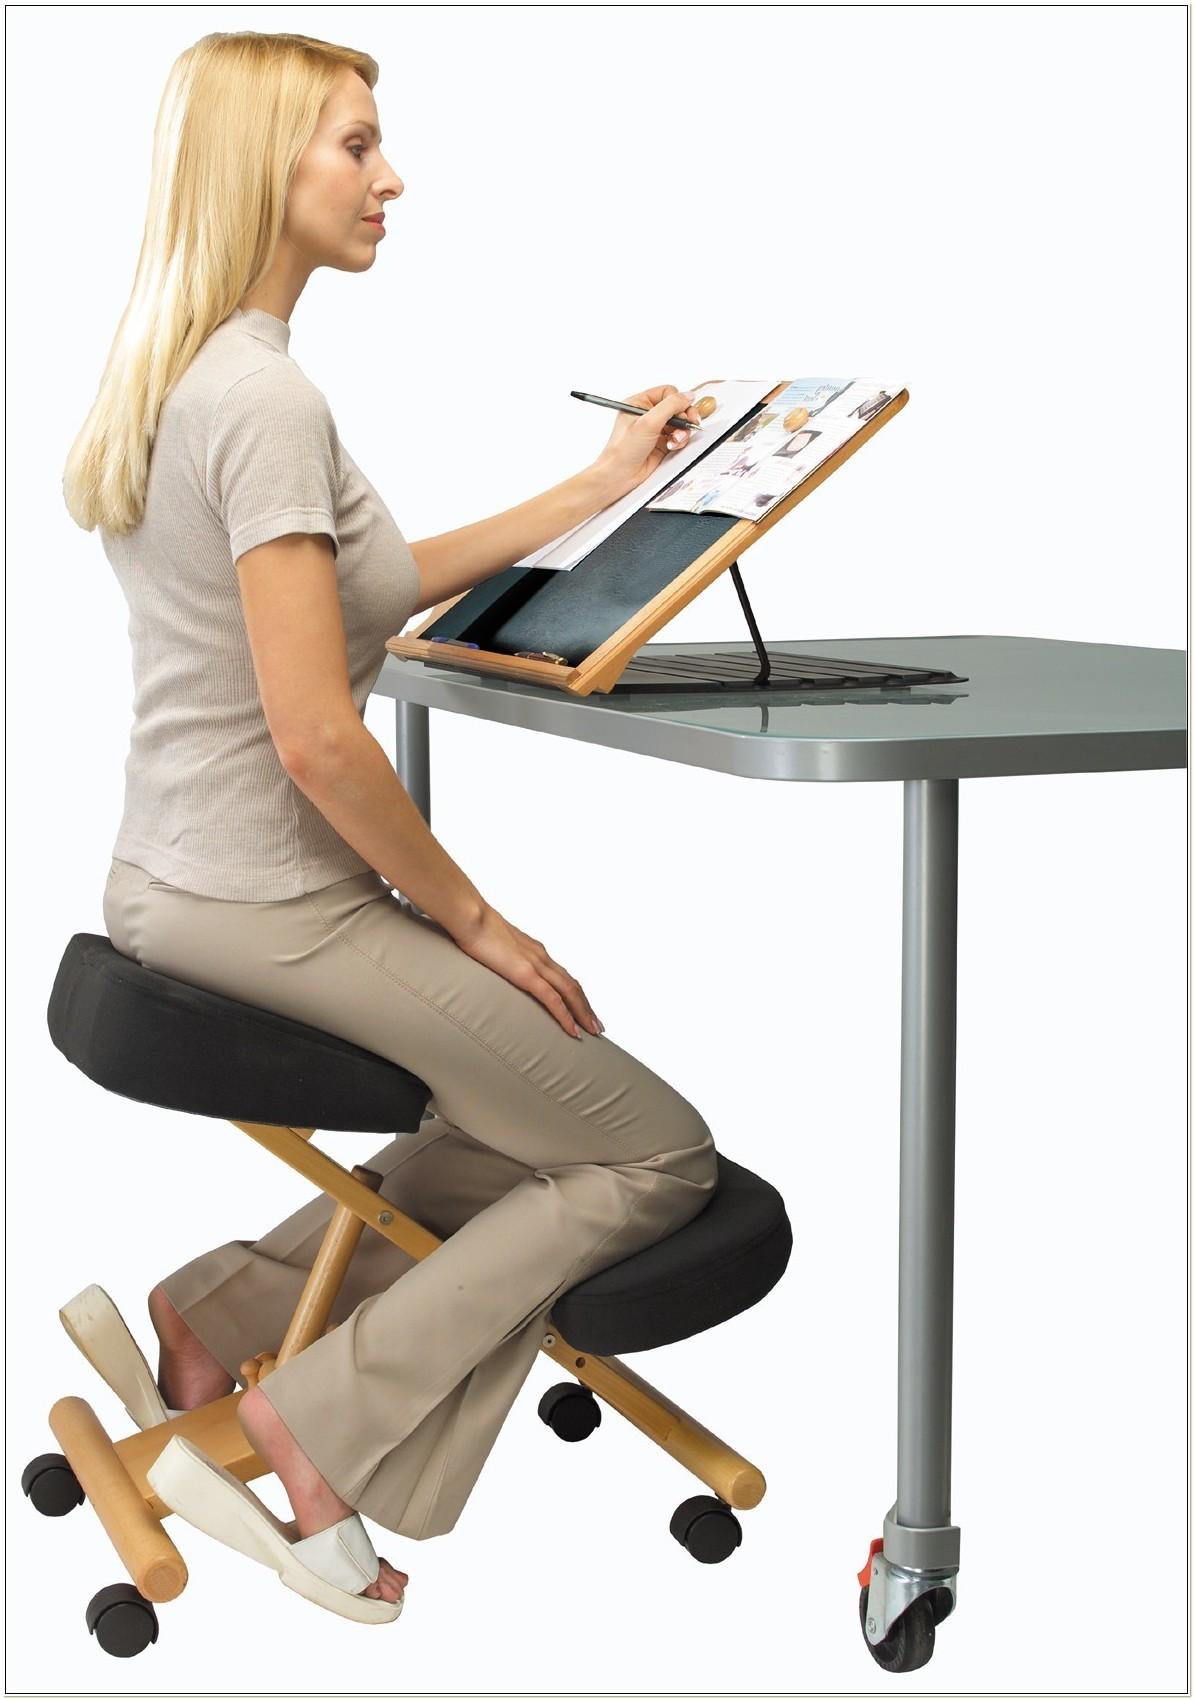 Ergonomic Office Chair Kneeling Posture